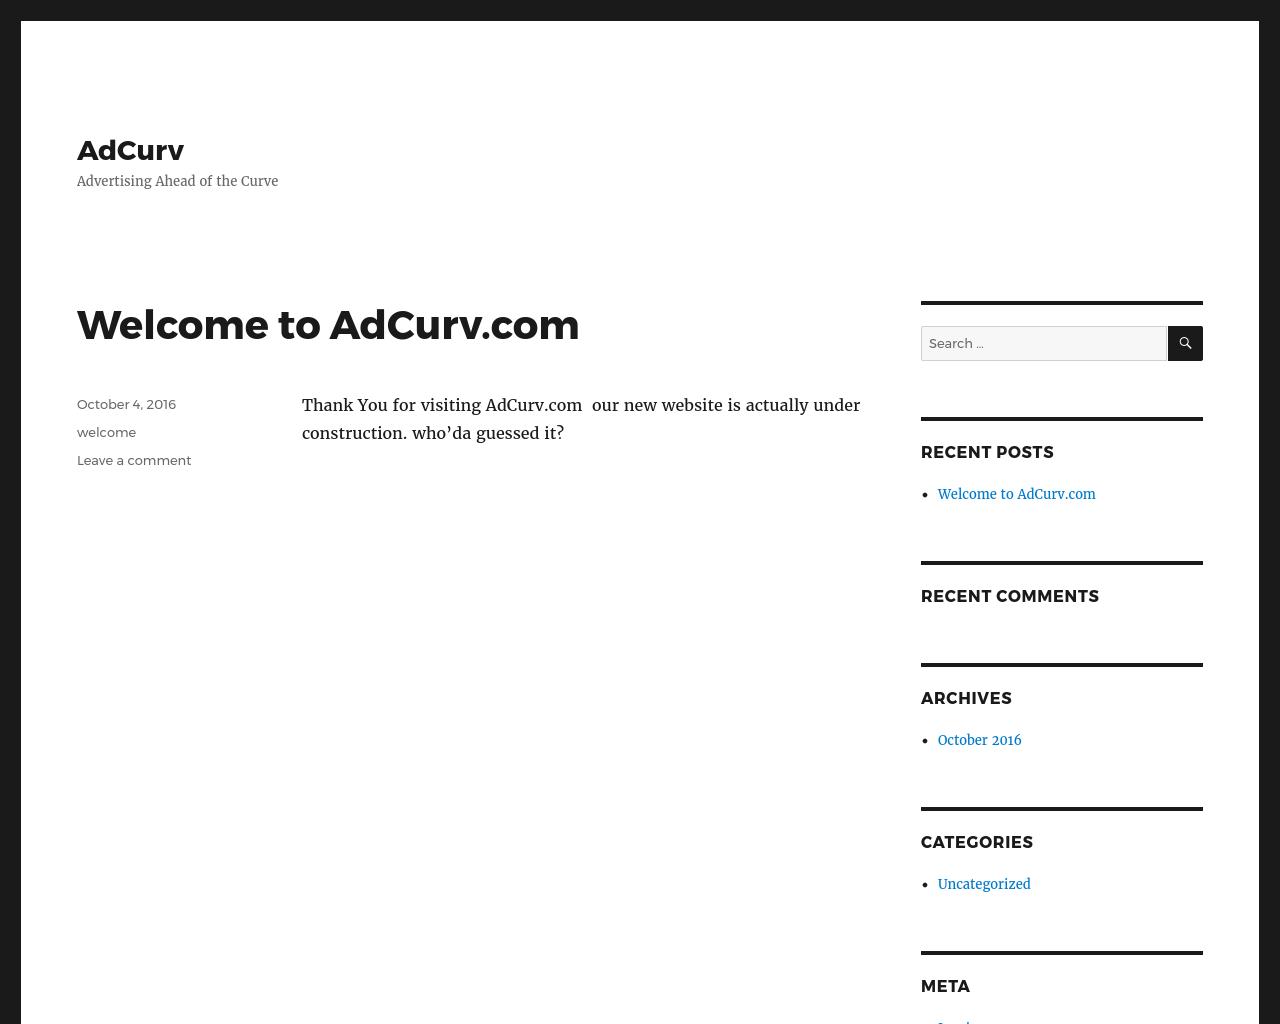 AdCurv-Advertising-Reviews-Pricing